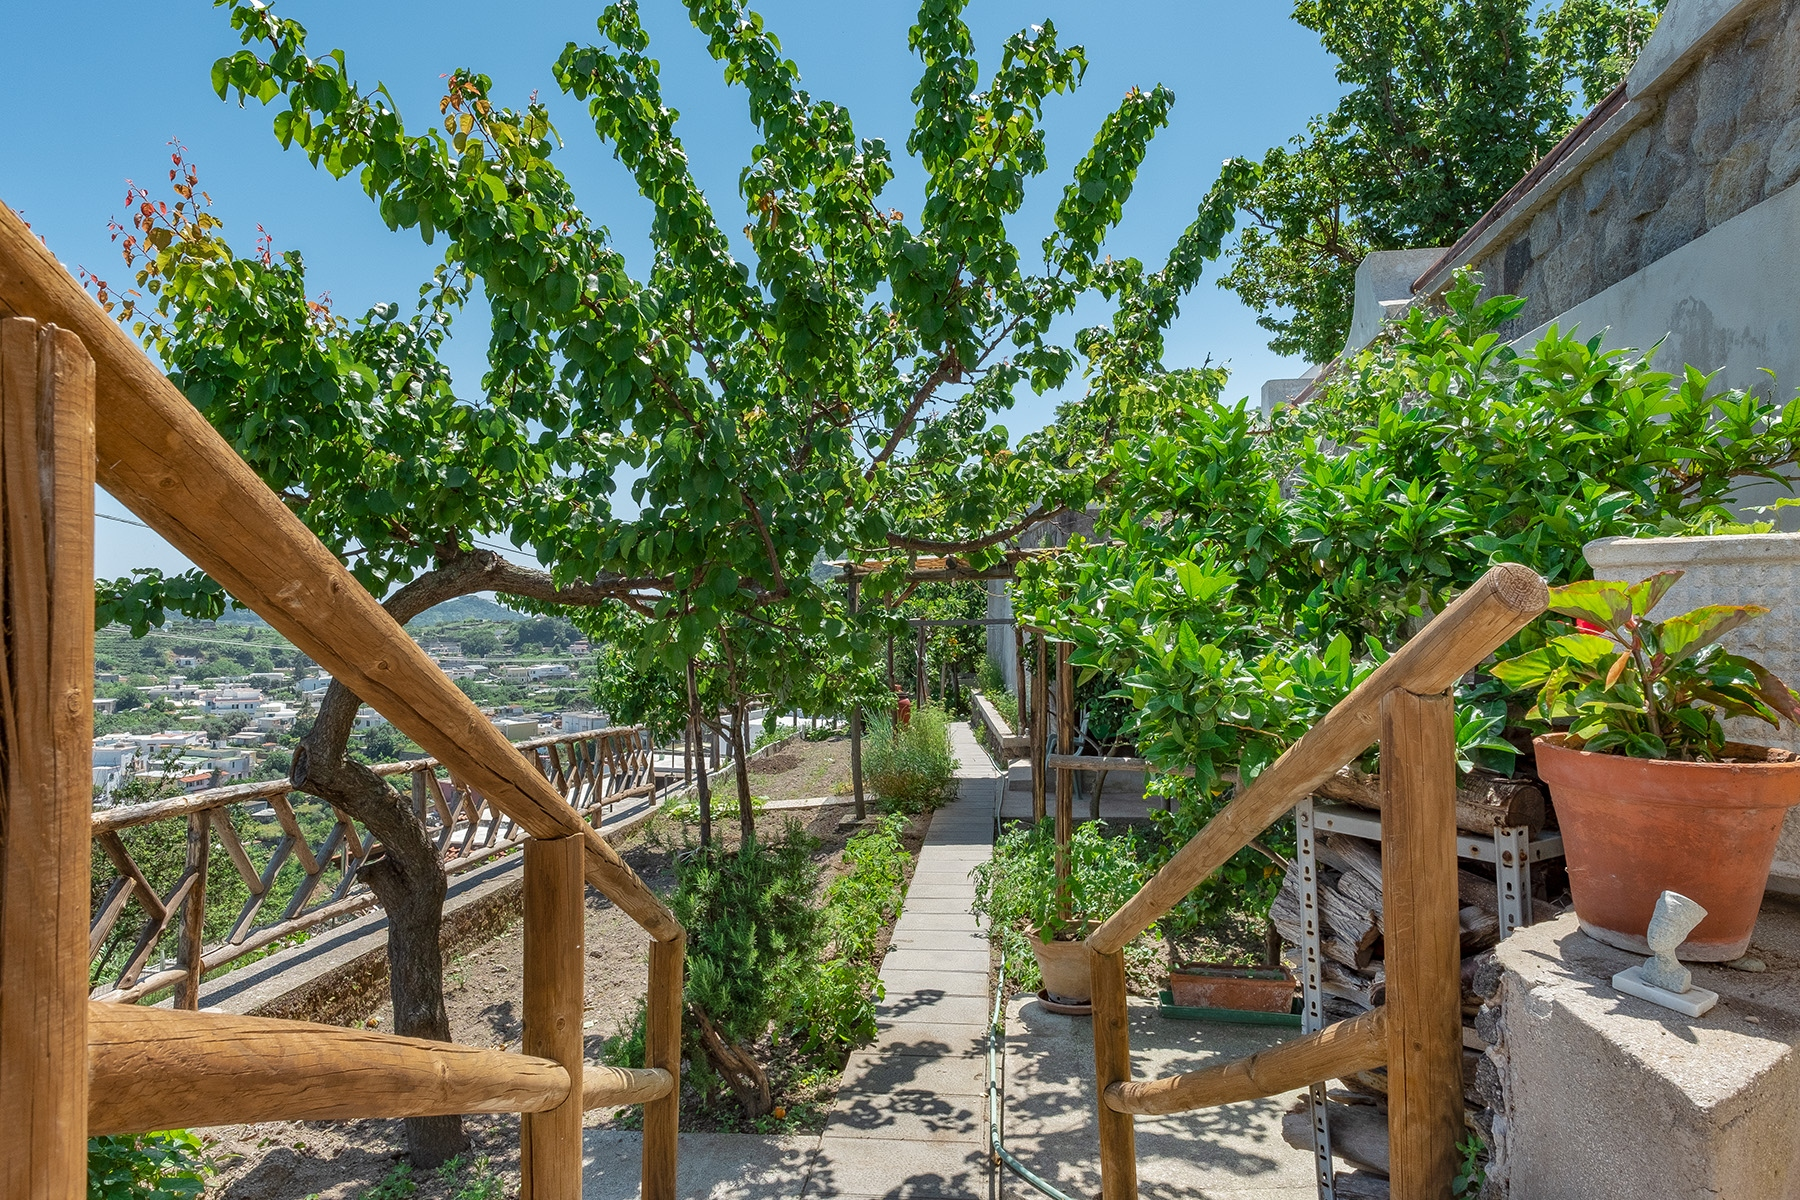 Villa in Vendita a Ischia: 5 locali, 138 mq - Foto 8